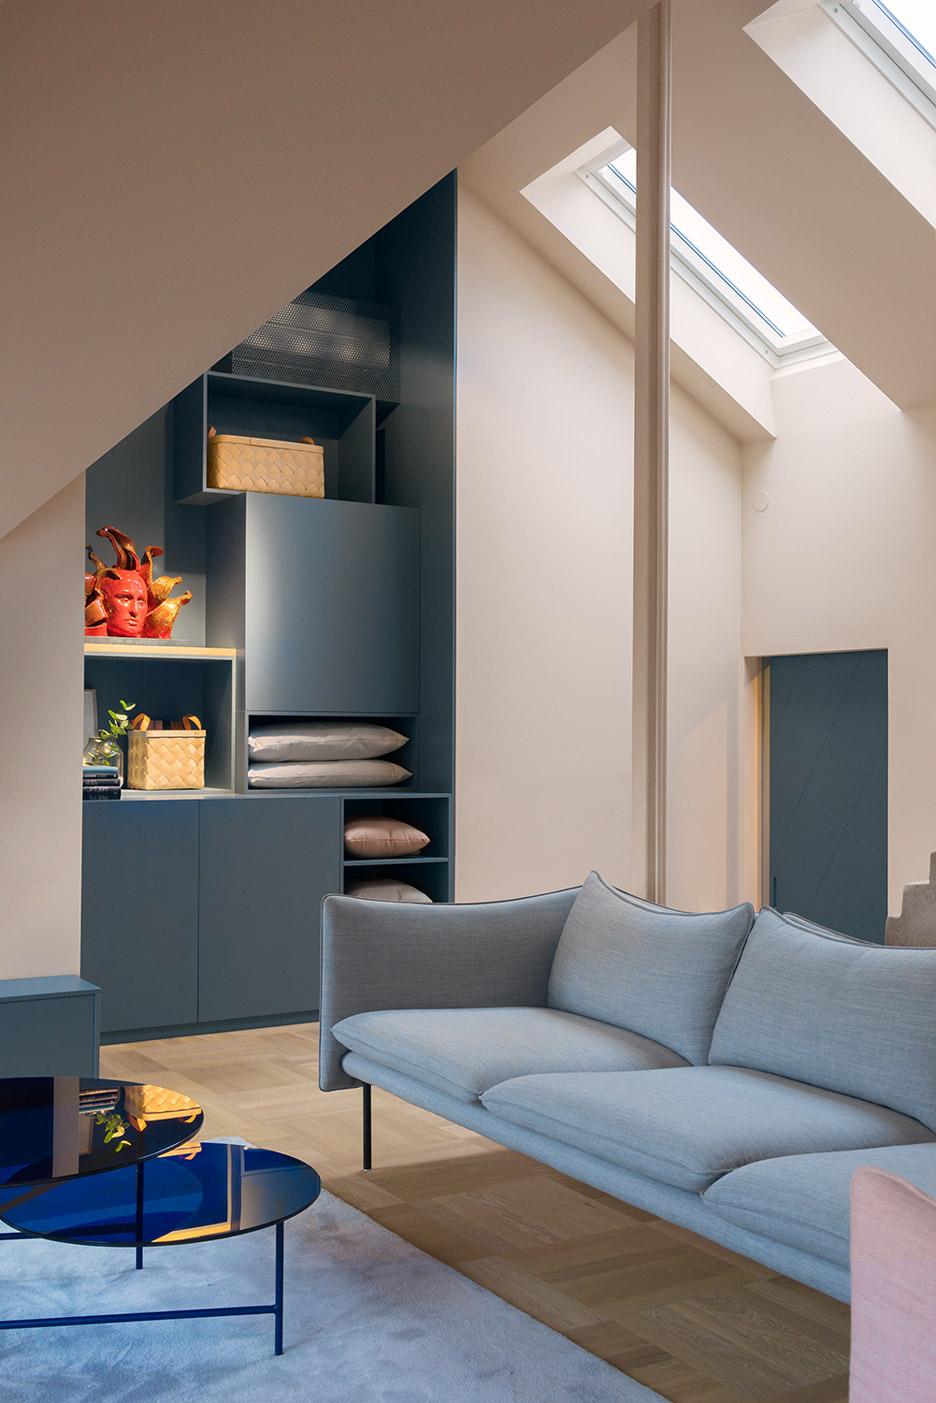 Casa-Ljungdahl-by-Note-Design-Studio_pantone2016